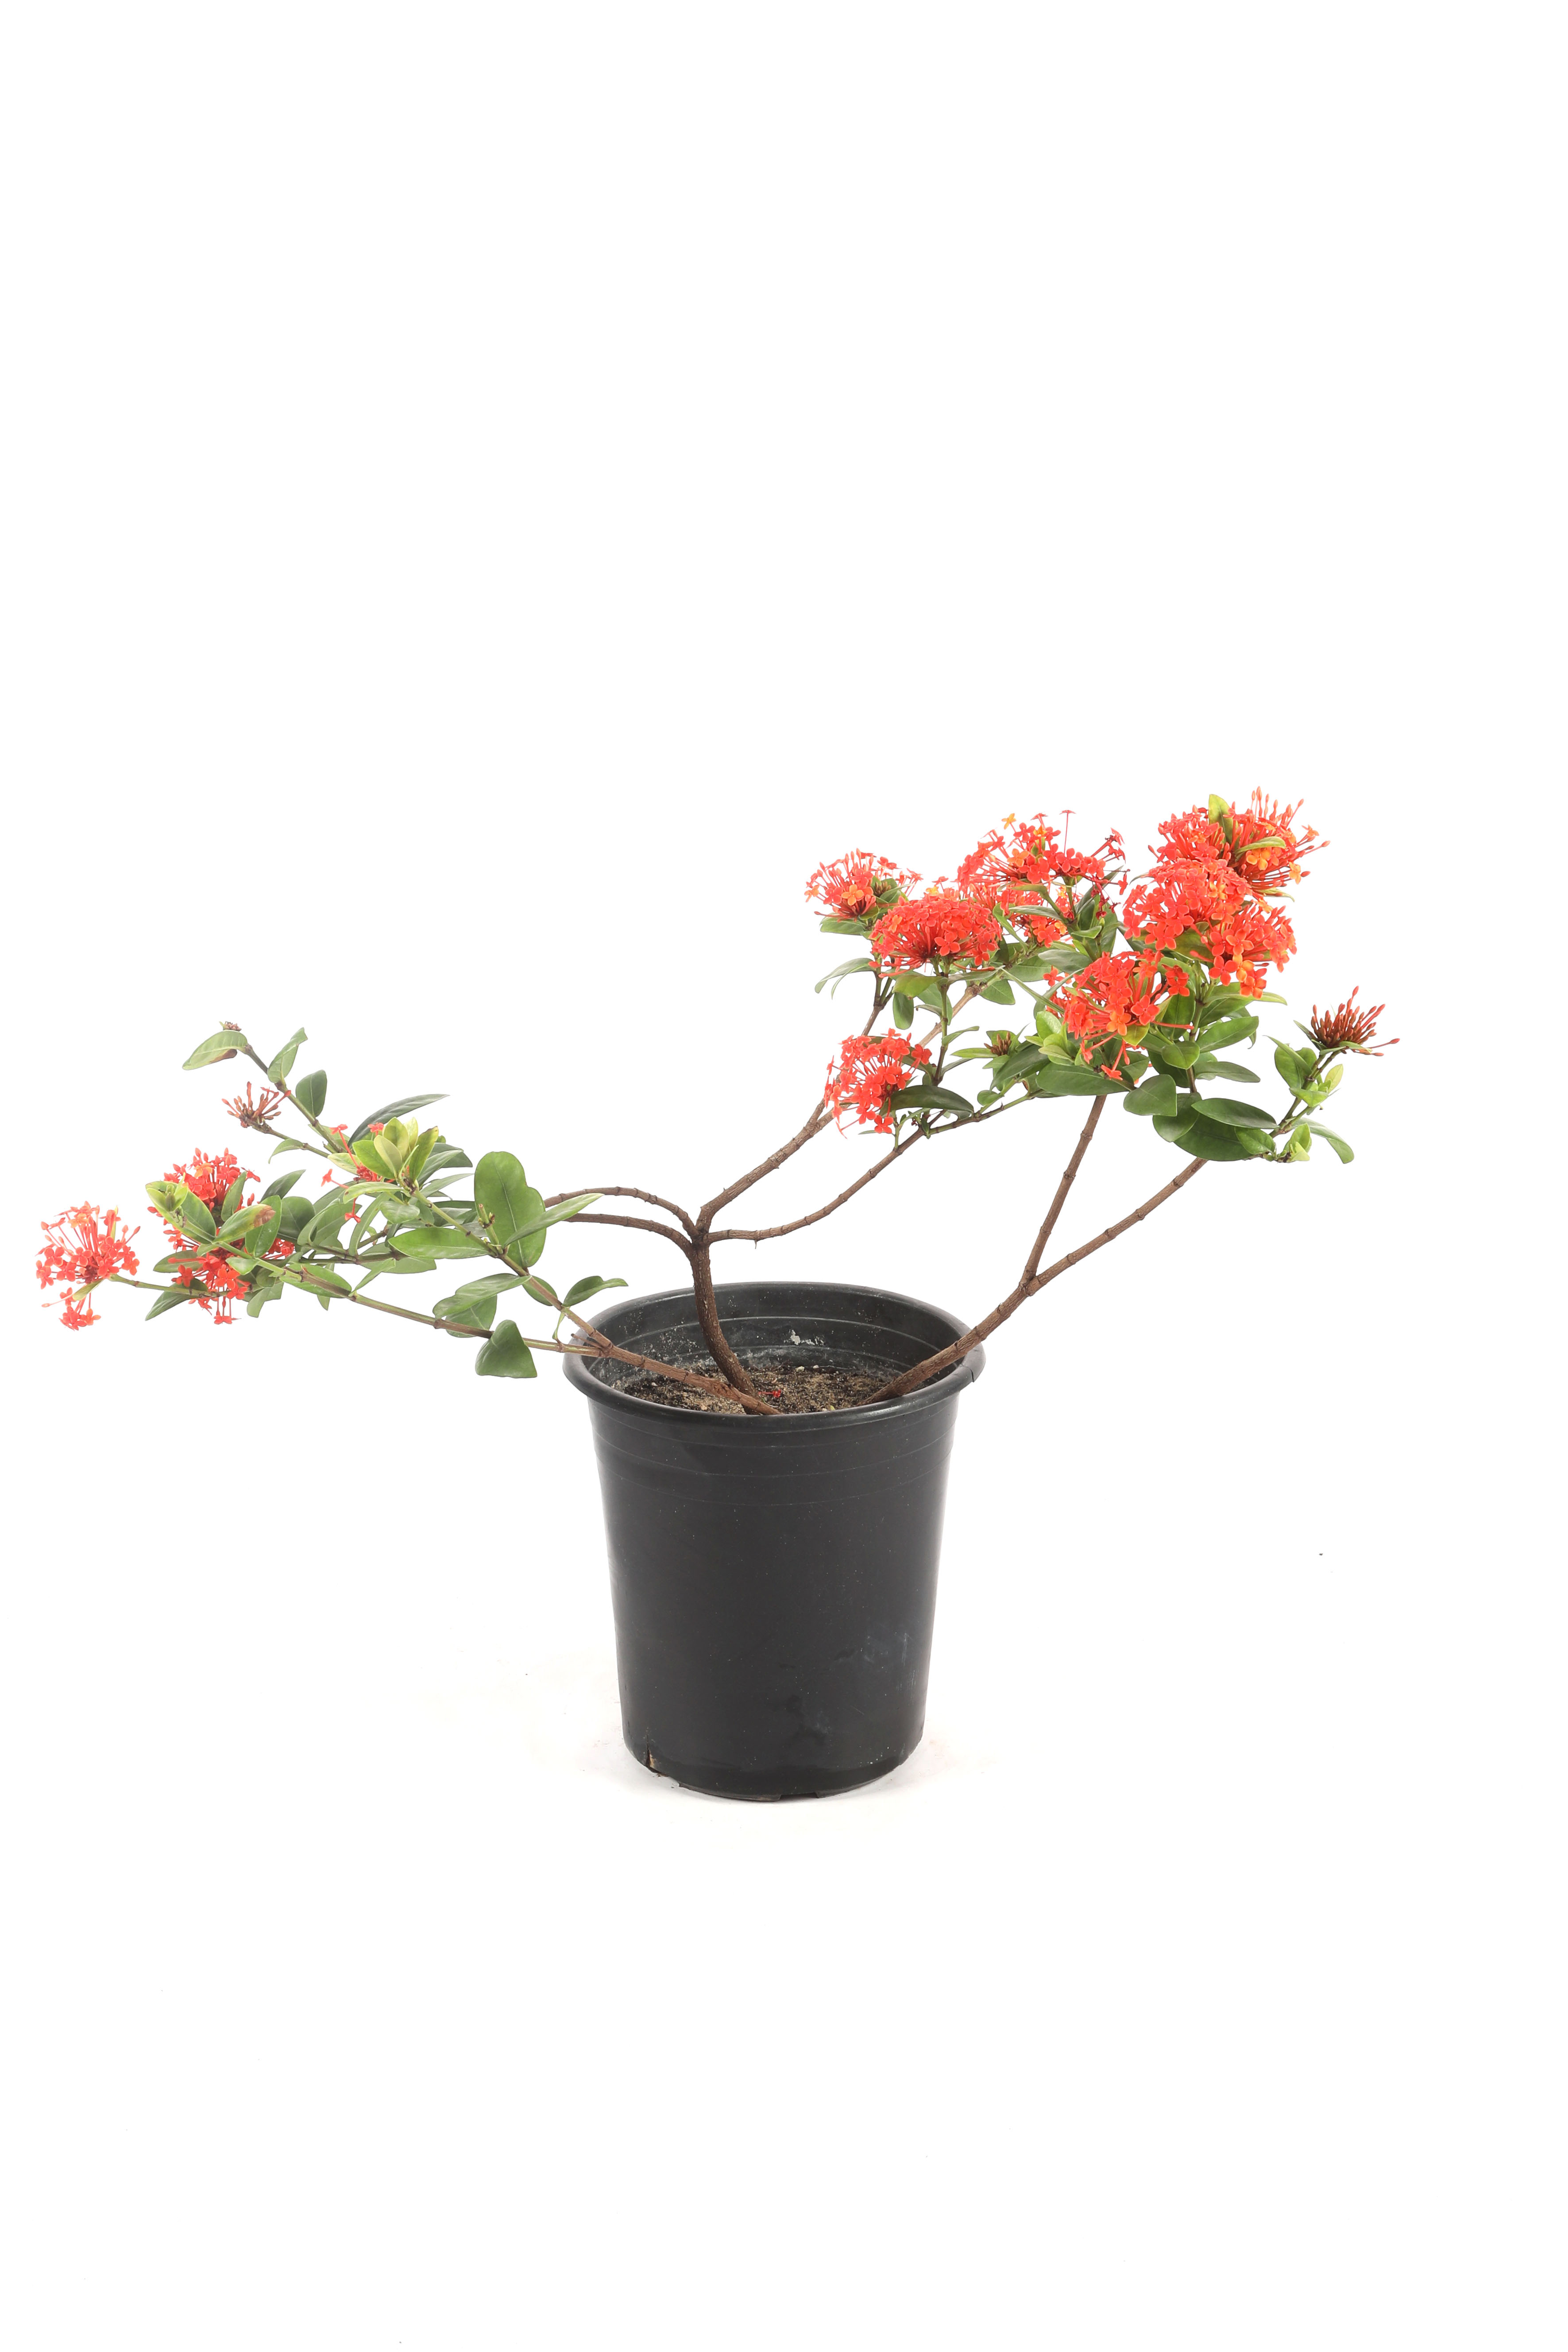 Ixora Coccinea 'Outdoor Plants'